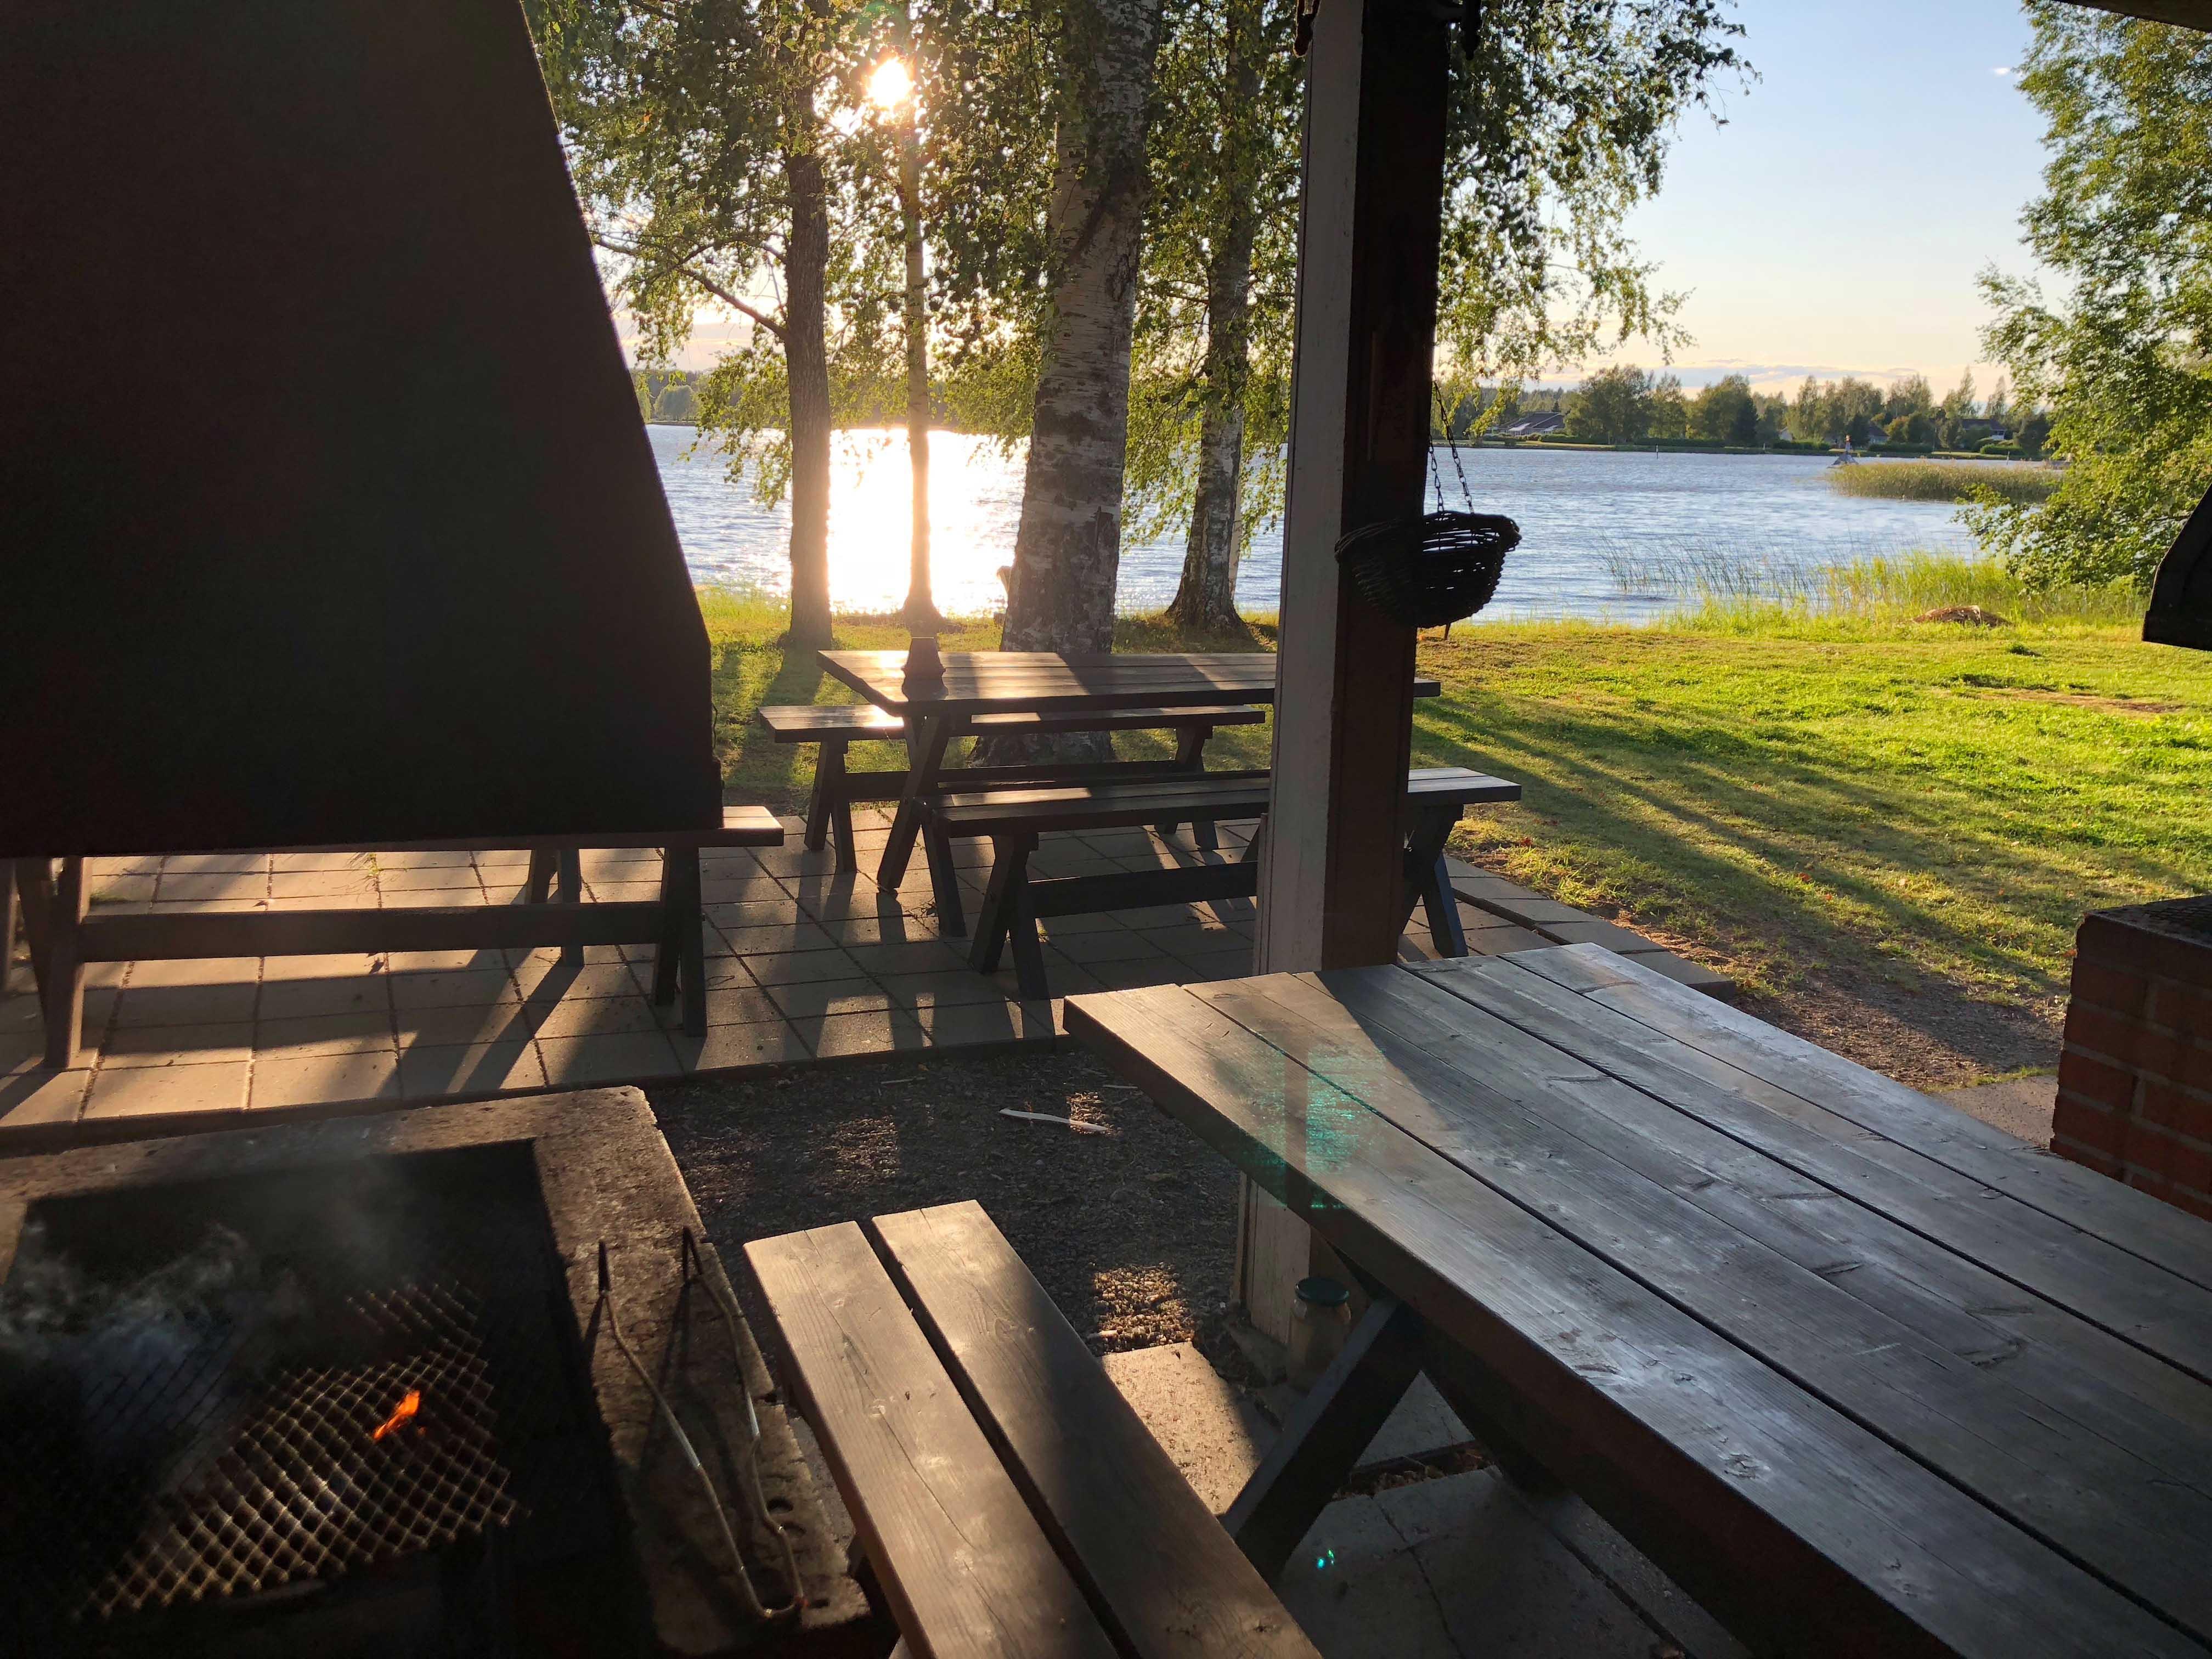 Camping_Sysmä08